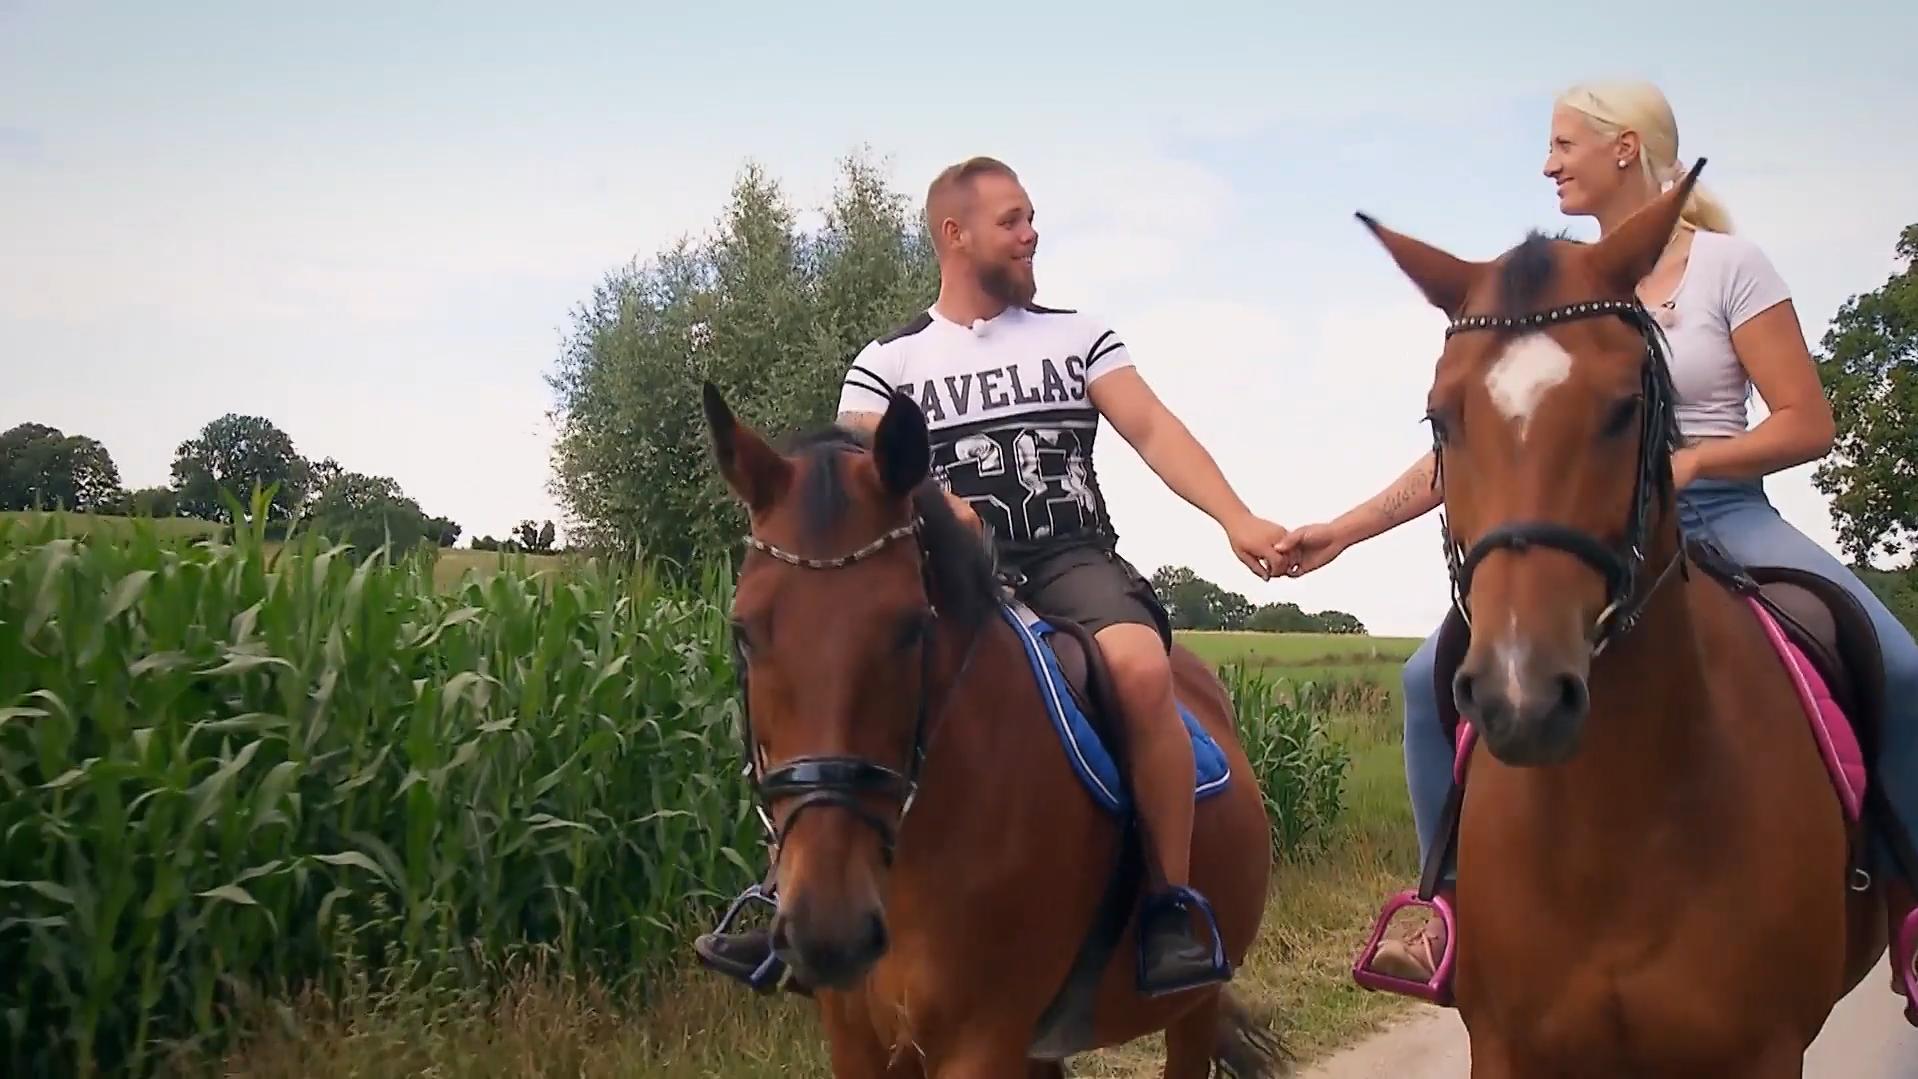 Bauer sucht Frau 2020: Beim Ausritt knisterts! Denise